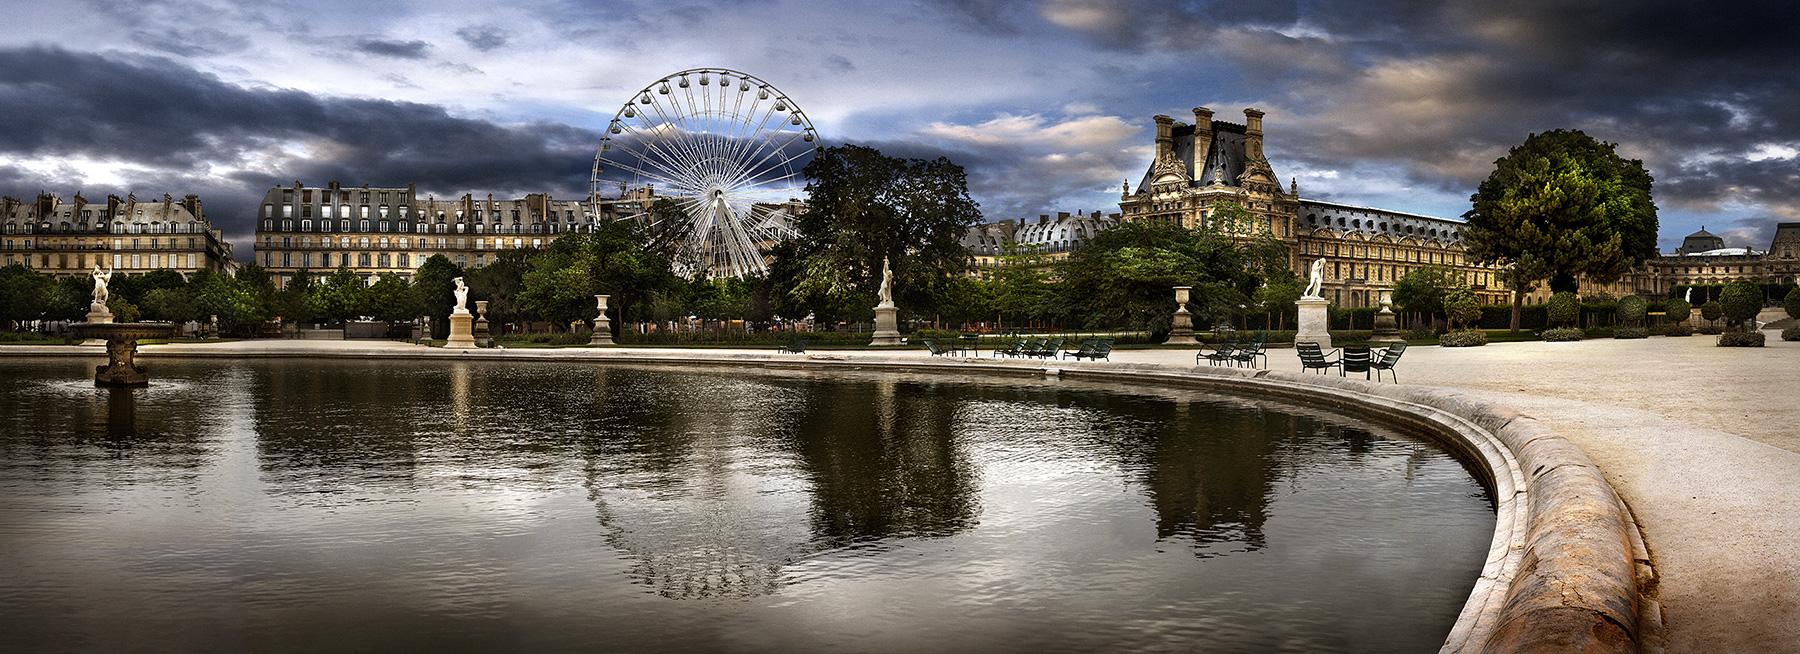 Le jardin des tuileries stephane rey gorrez photographe for Jardin des tuileries 2016